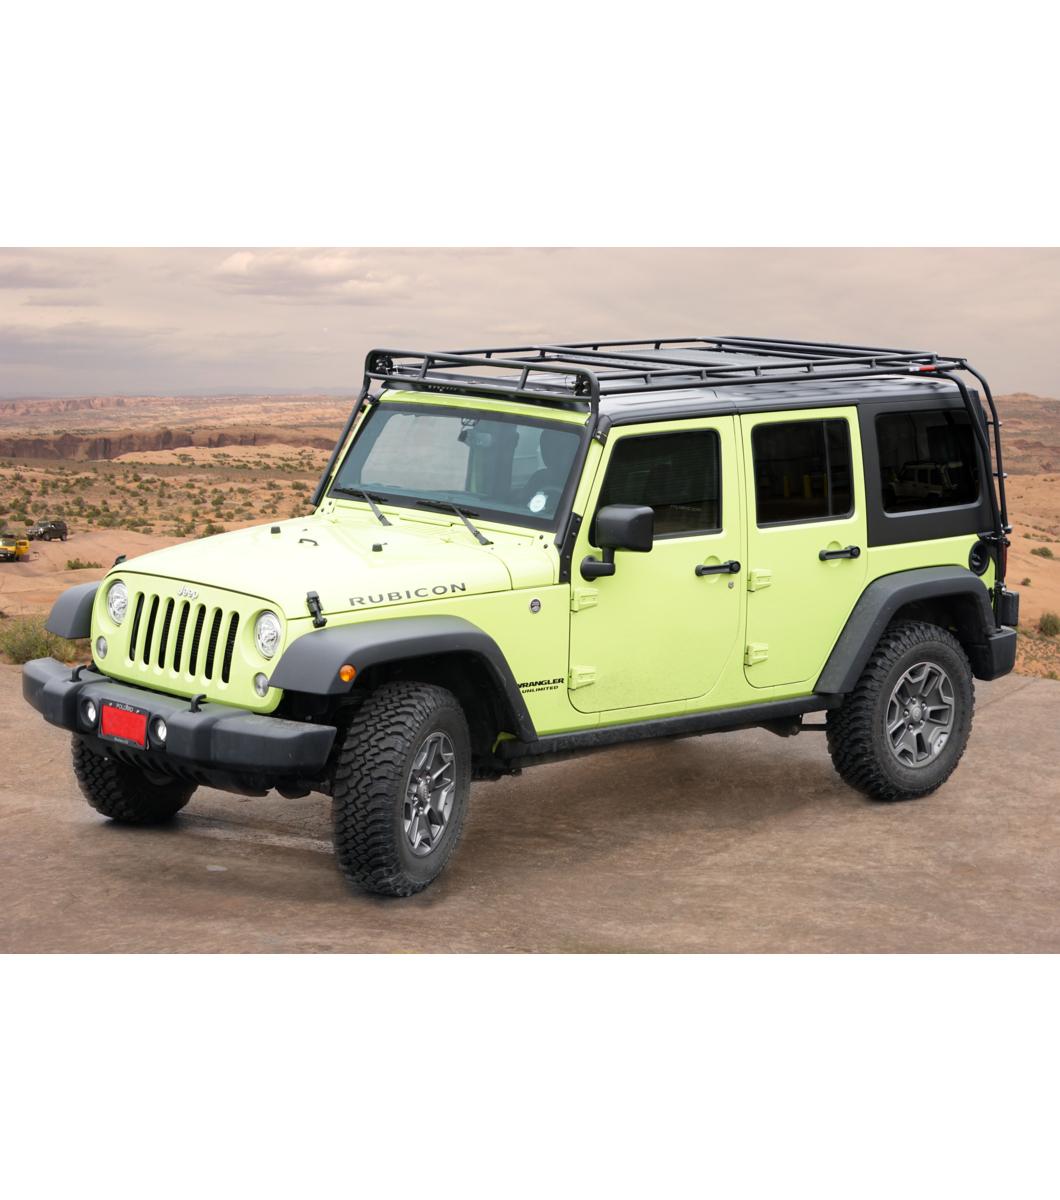 Jeep Jku Roof Rack >> JEEP JKU 4DOOR· STEALTH RACK· 4 Independent LED Lights - Gobi Racks